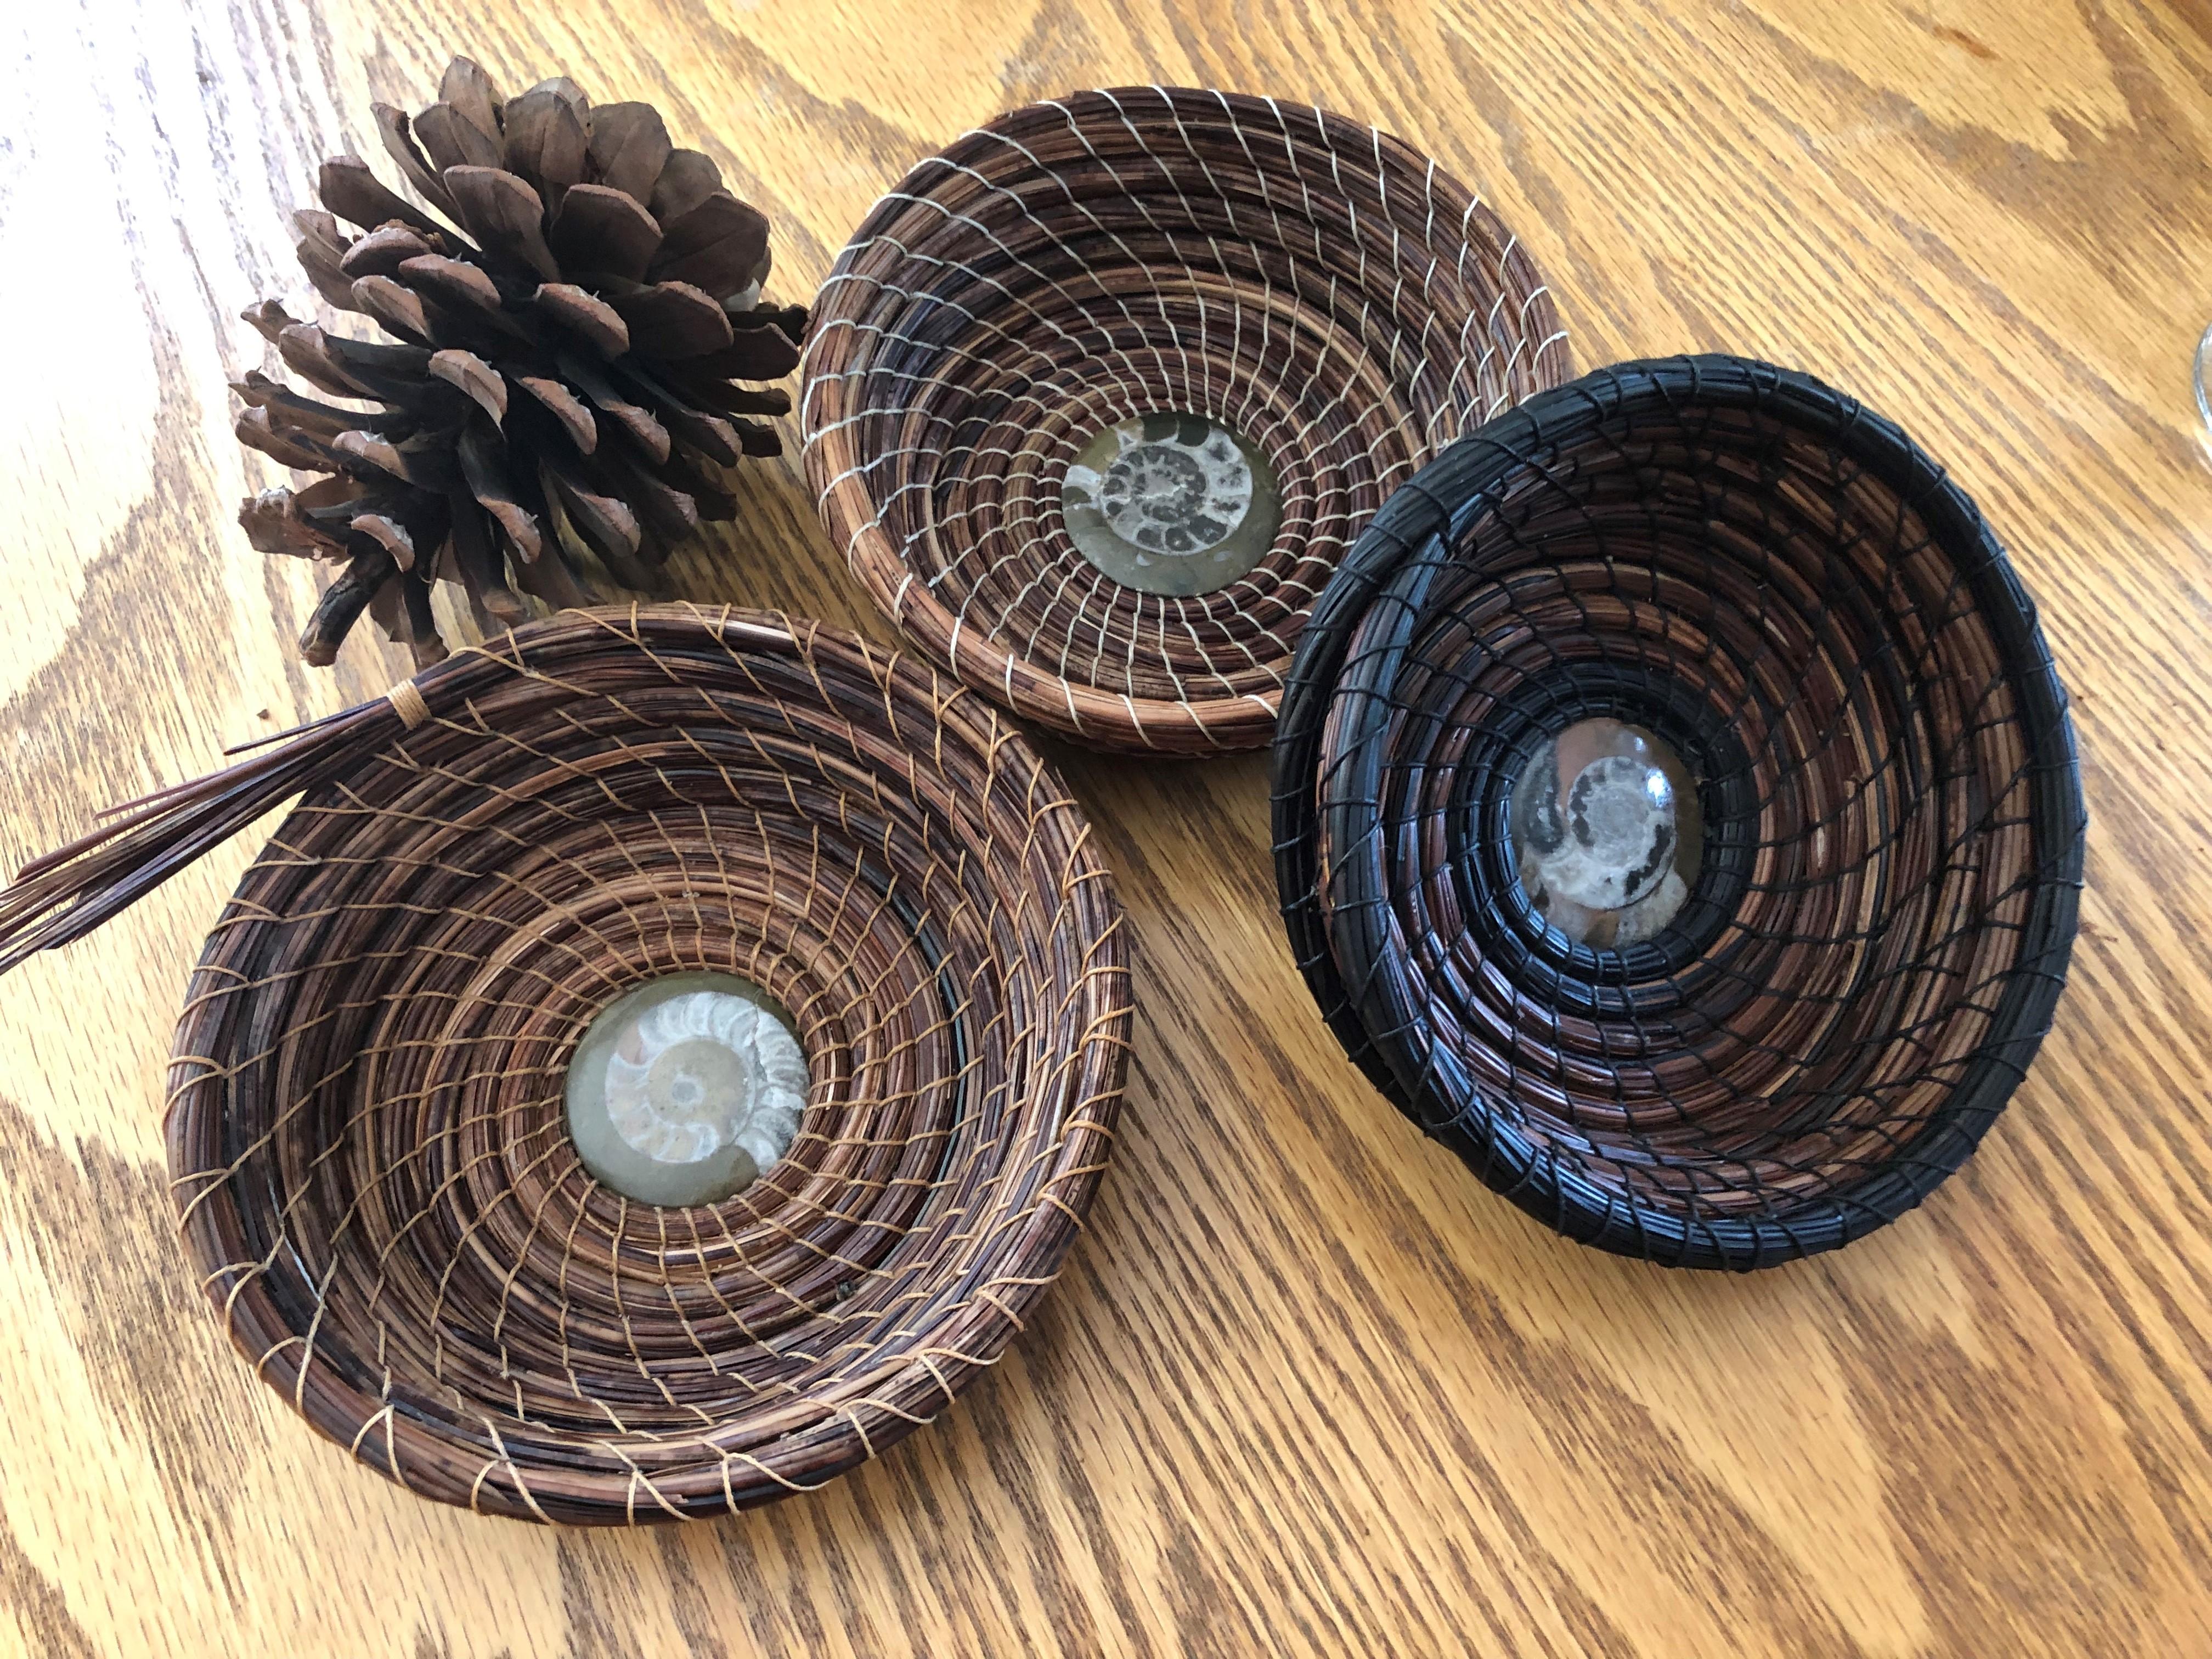 FULL Ponderosa Pine Basket Weaving